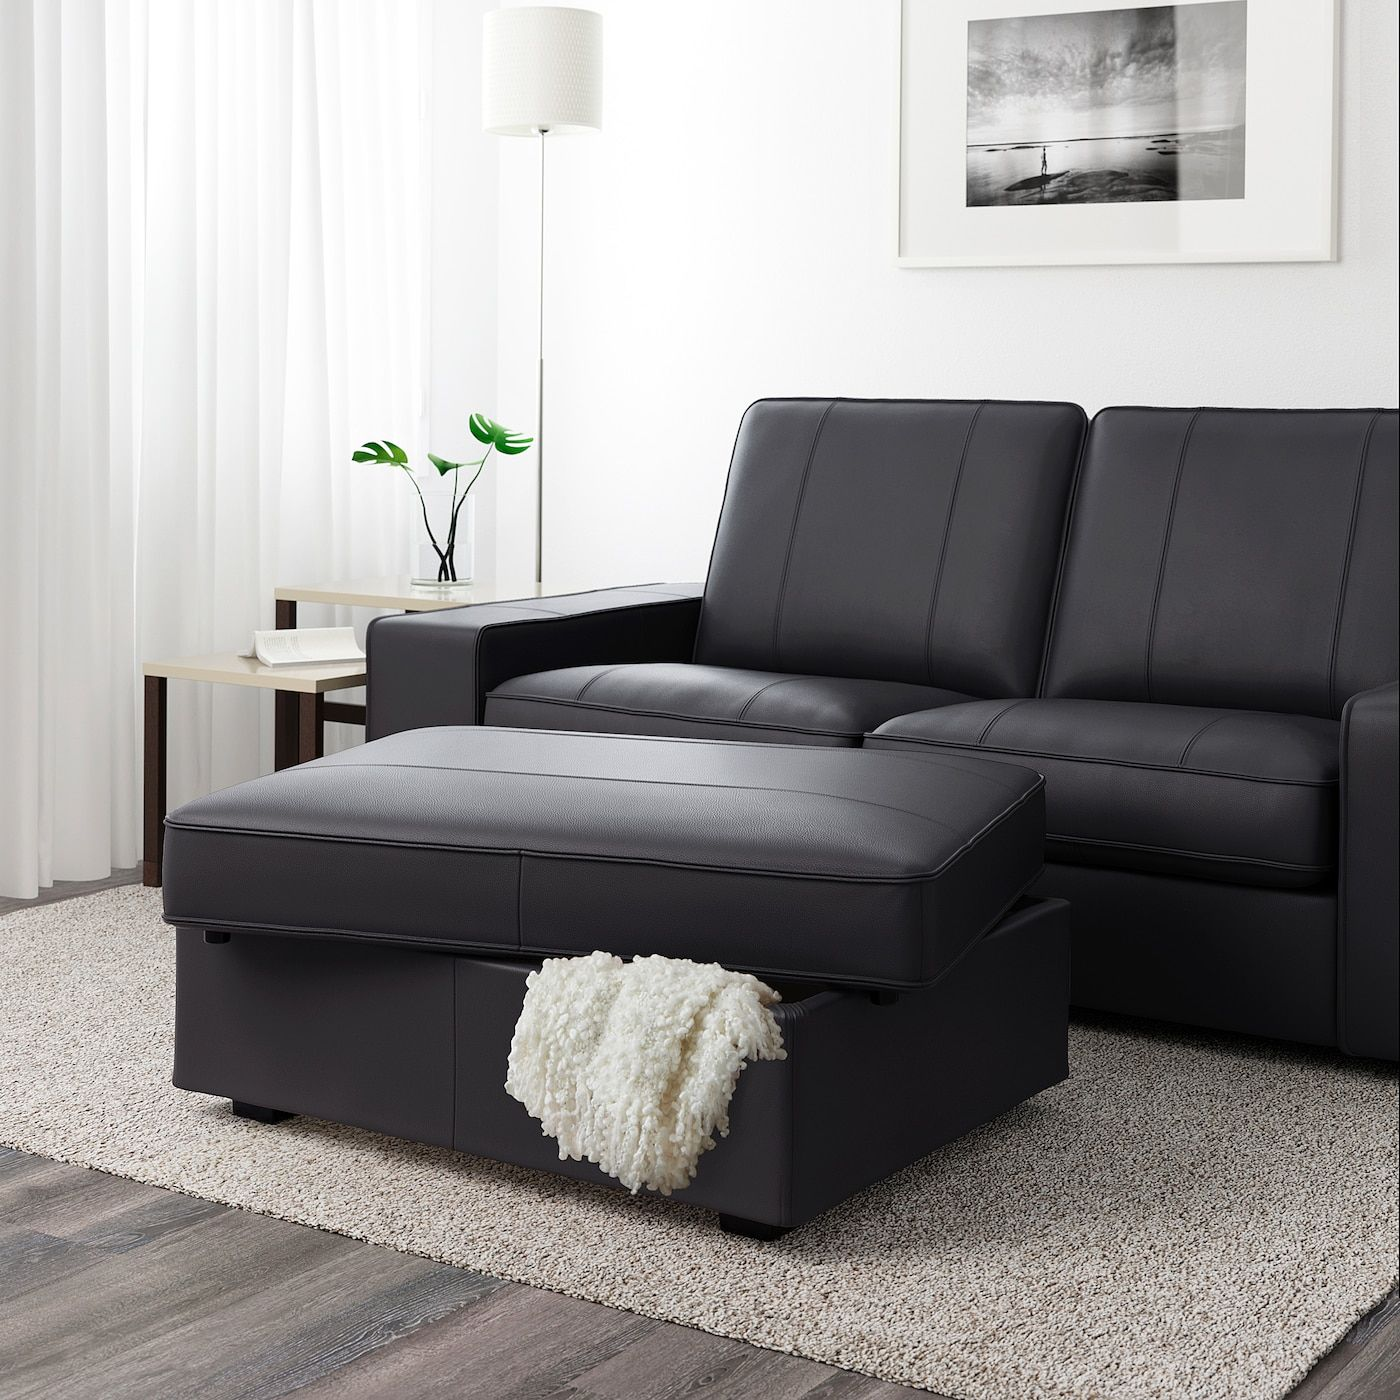 Ikea Kivik Grann Bomstad Black Ottoman In 2020 Ottoman In